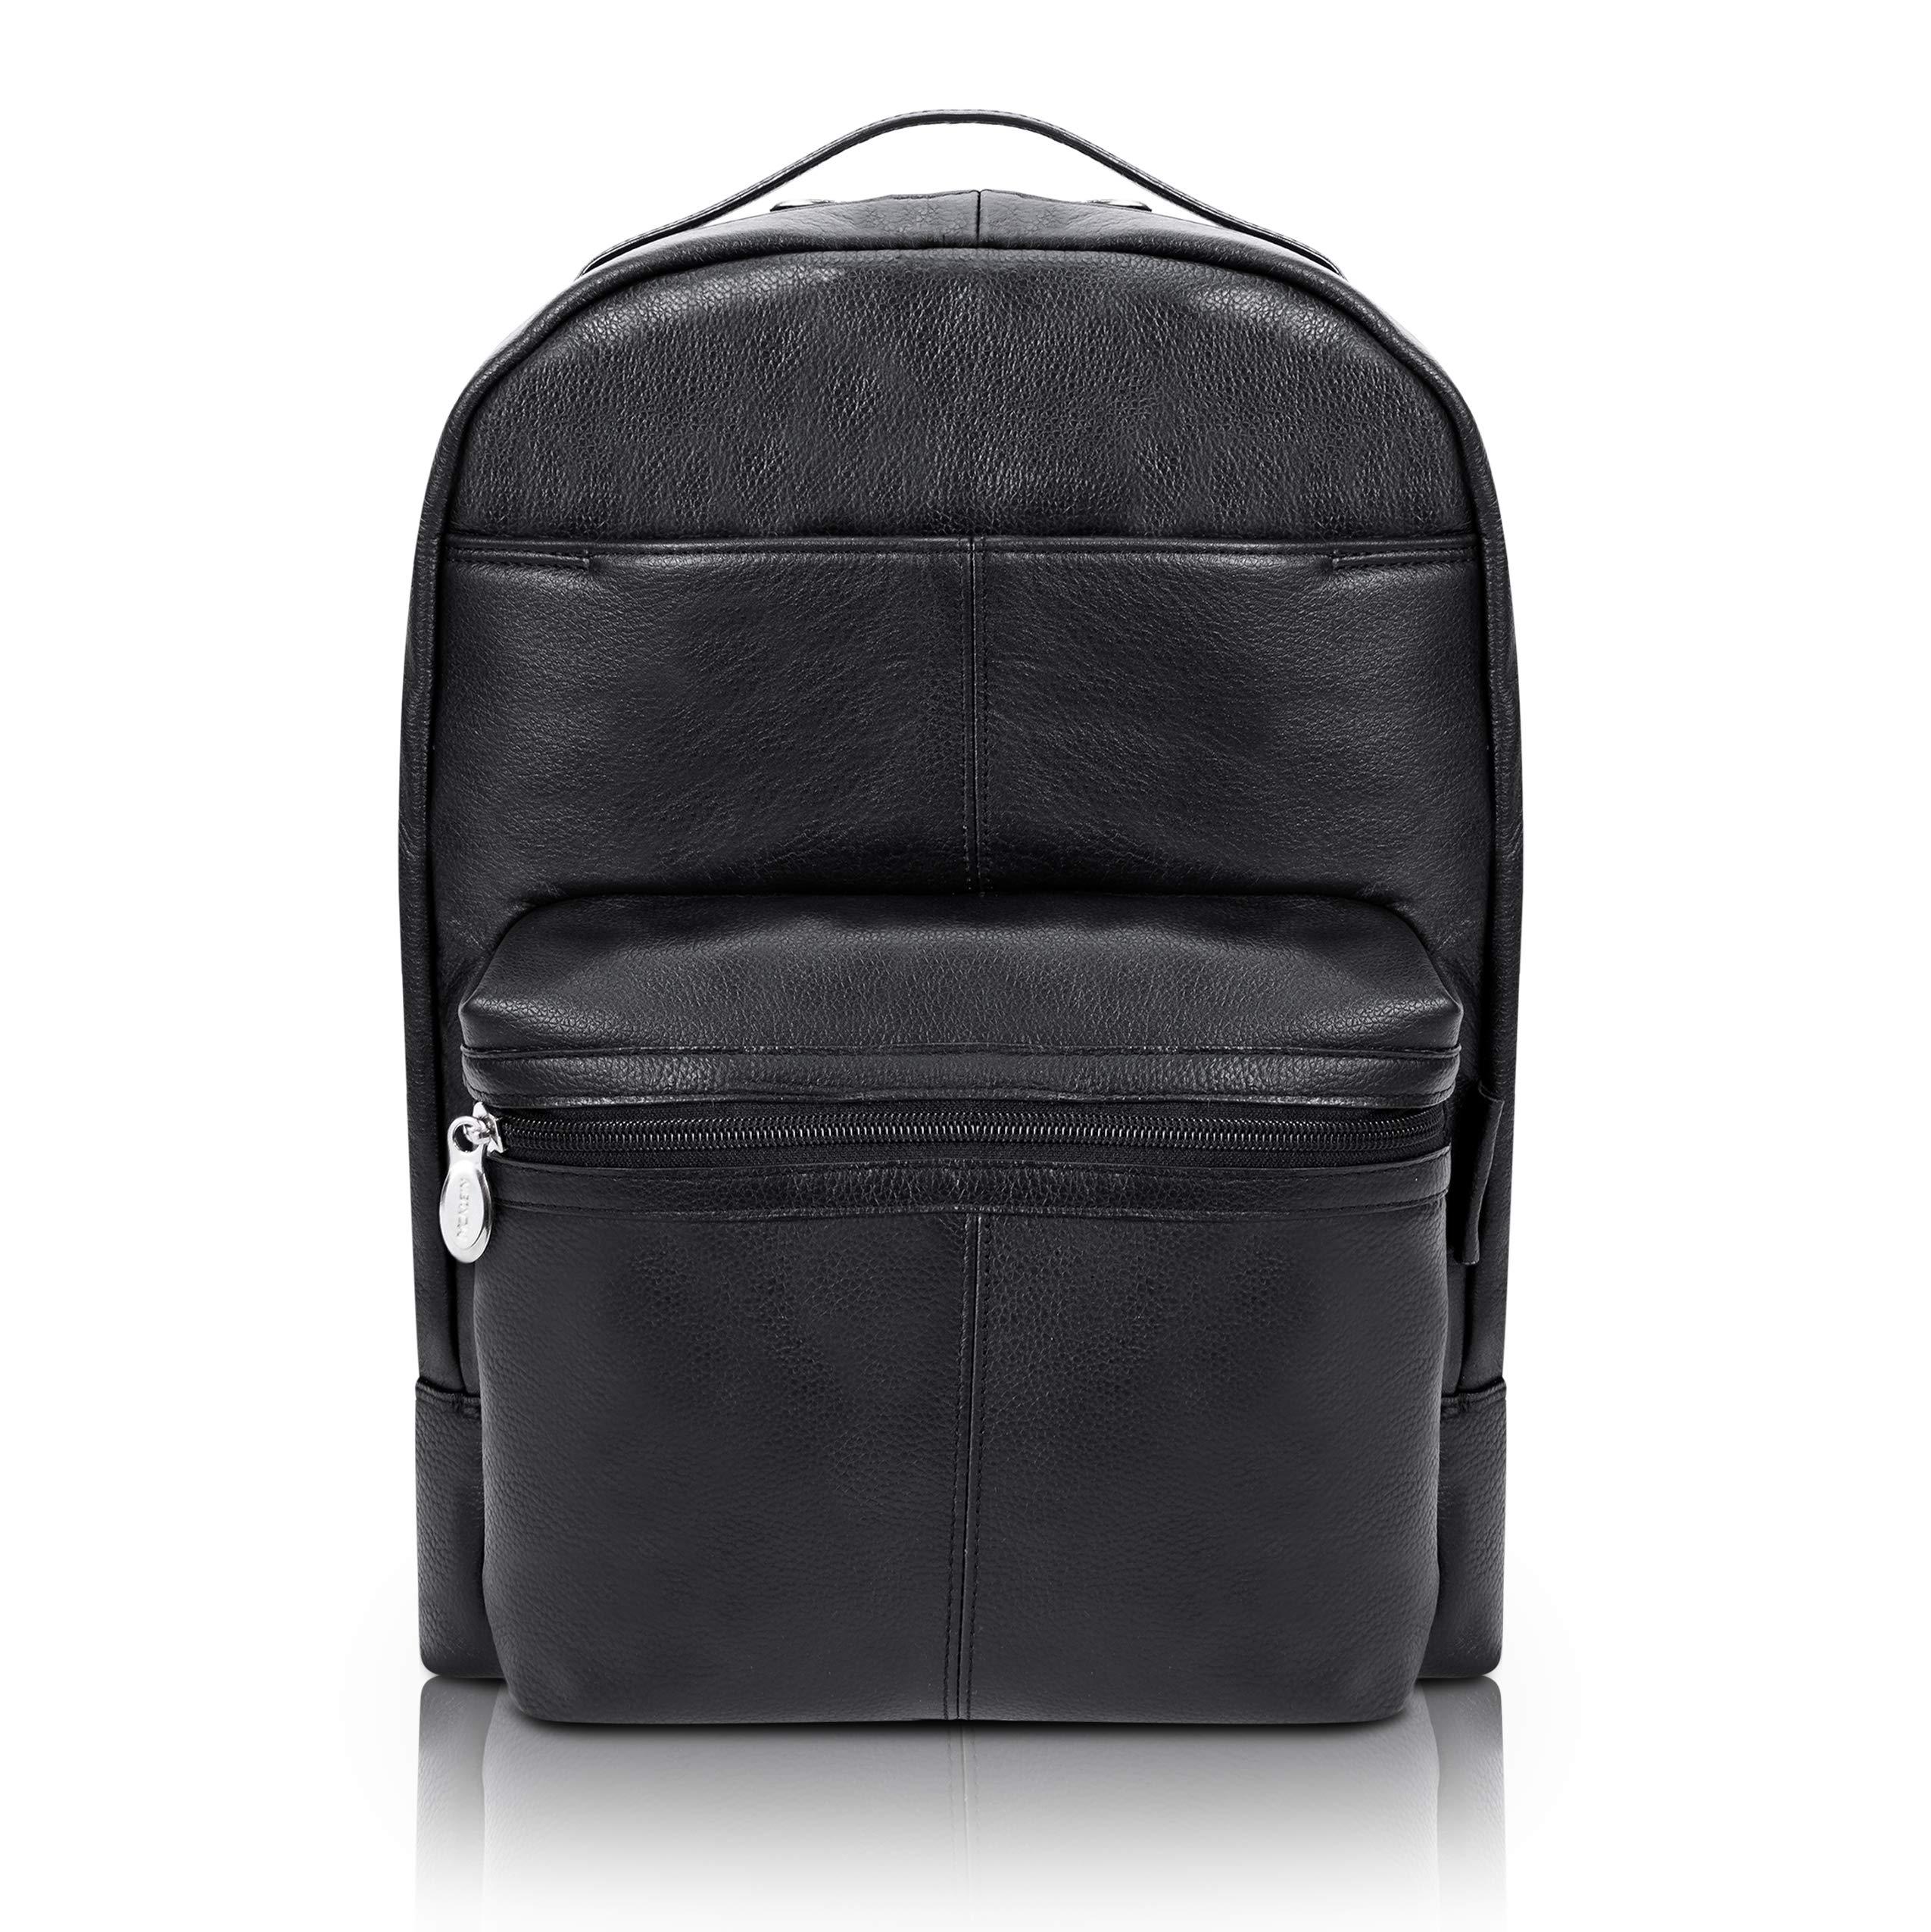 "McKlein, S Series, Parker, Pebble Grain Calfskin Leather, 15"" Leather Dual Compartment Laptop Backpack, Black (88555)"